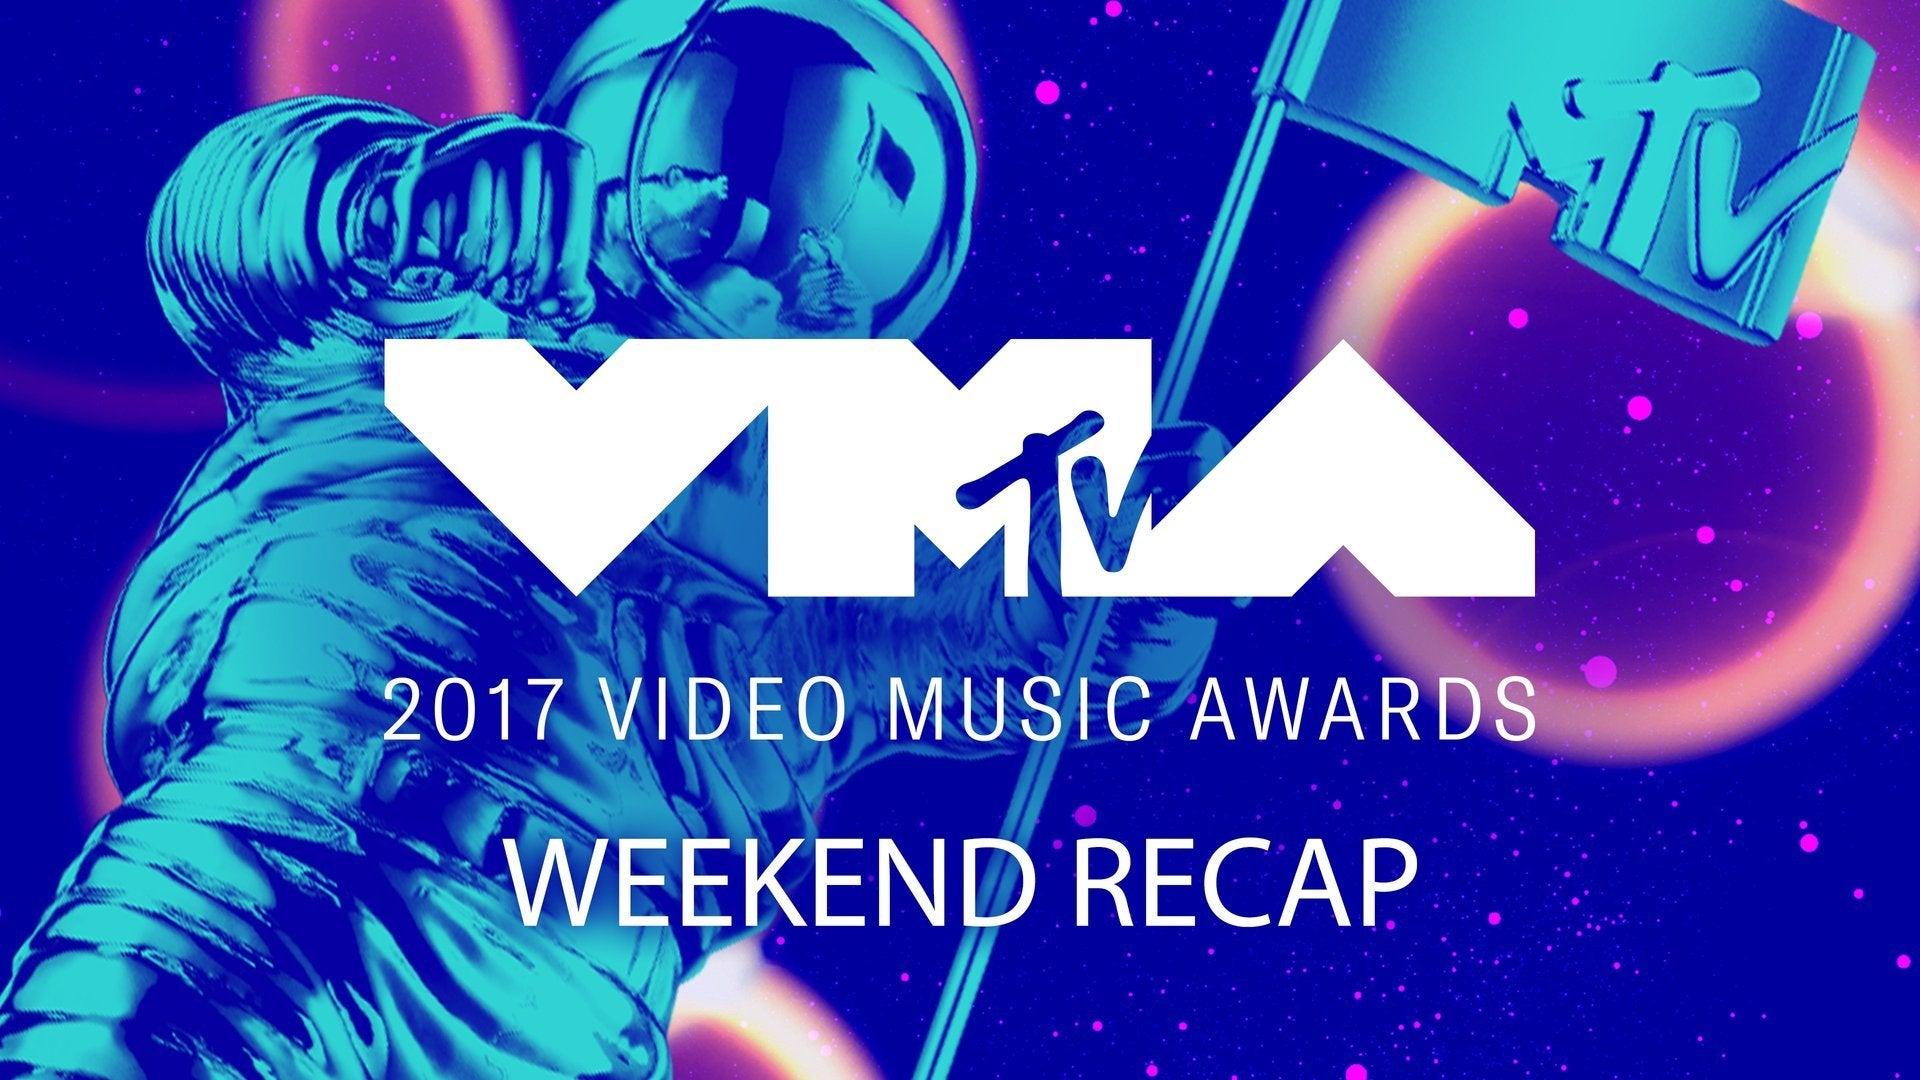 2017 VMA Weekend Recap